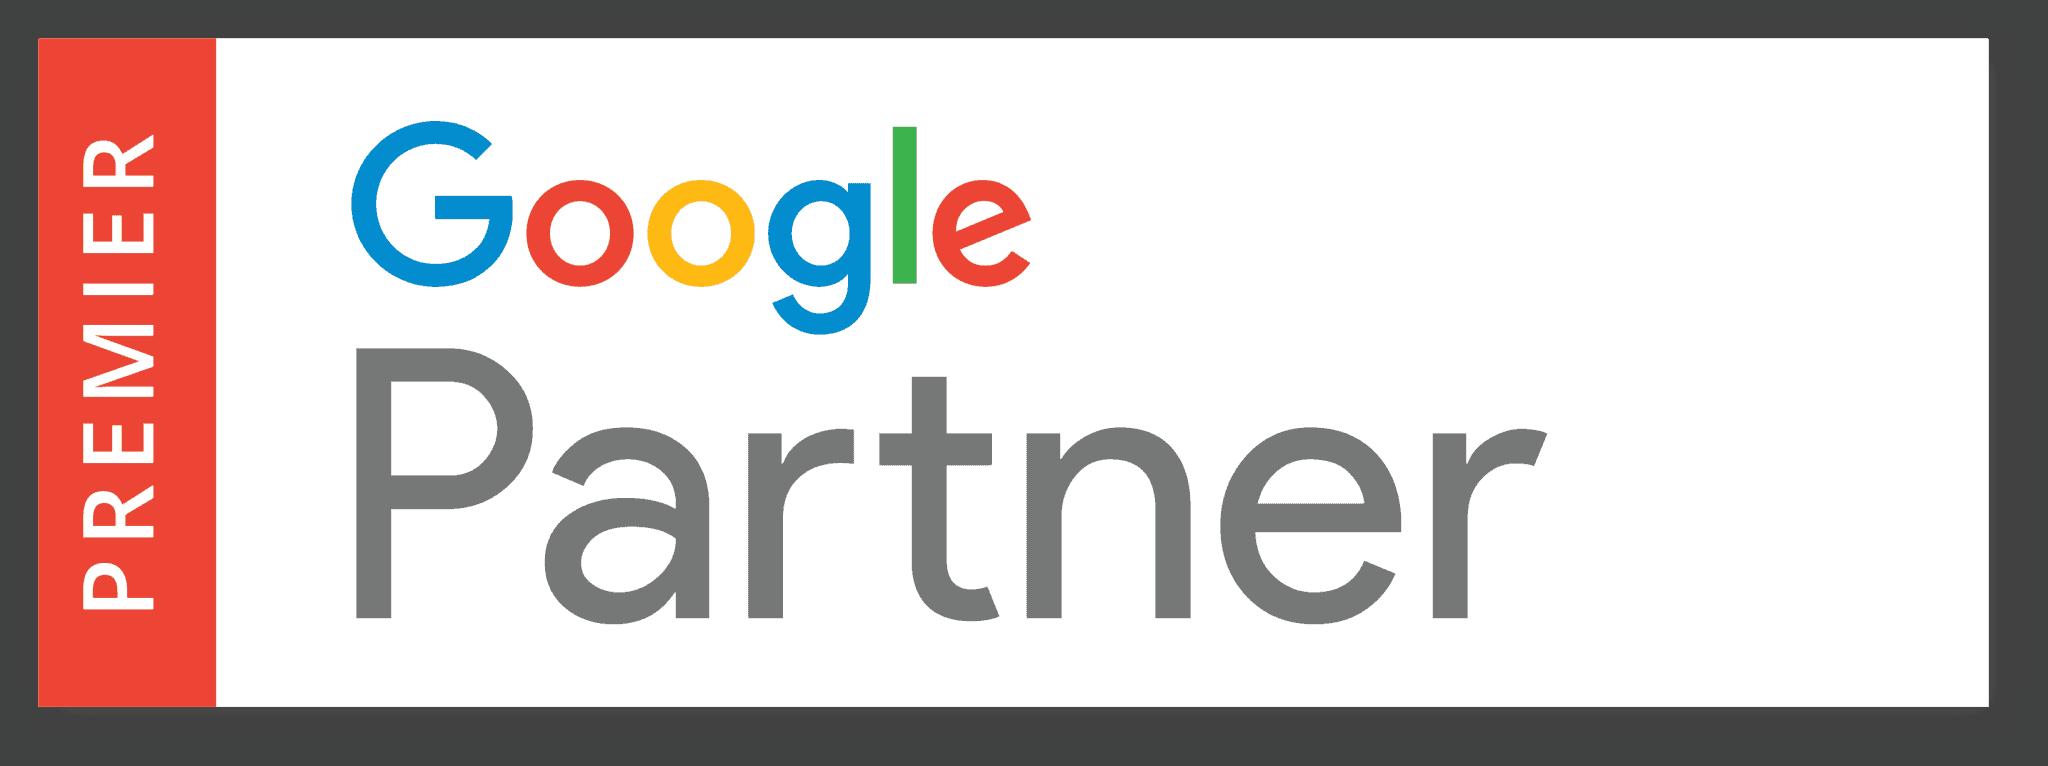 Google partner - Top Growth Marketing